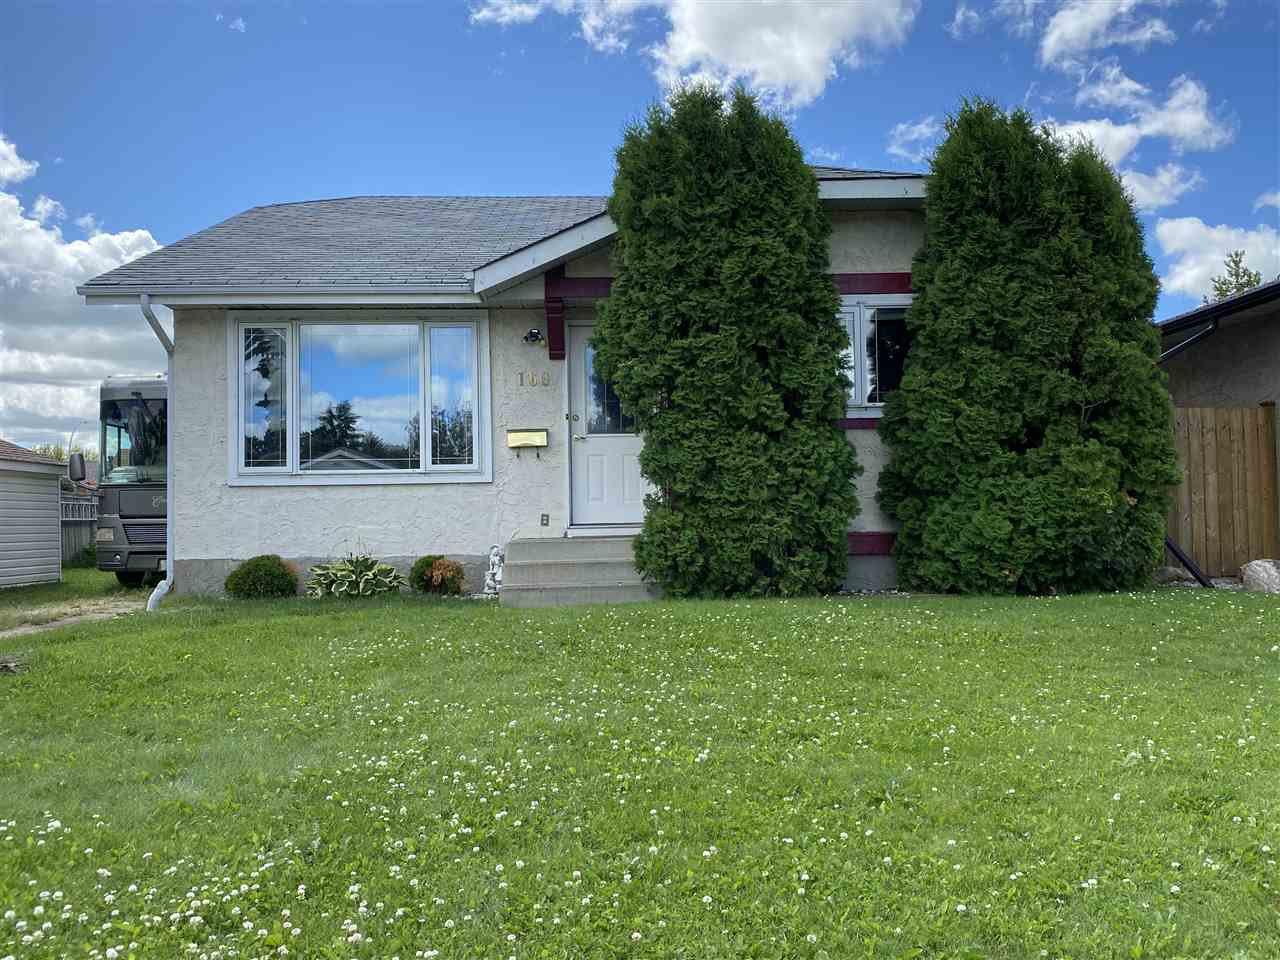 Main Photo: 169 Garnet Crescent: Wetaskiwin House for sale : MLS®# E4207762